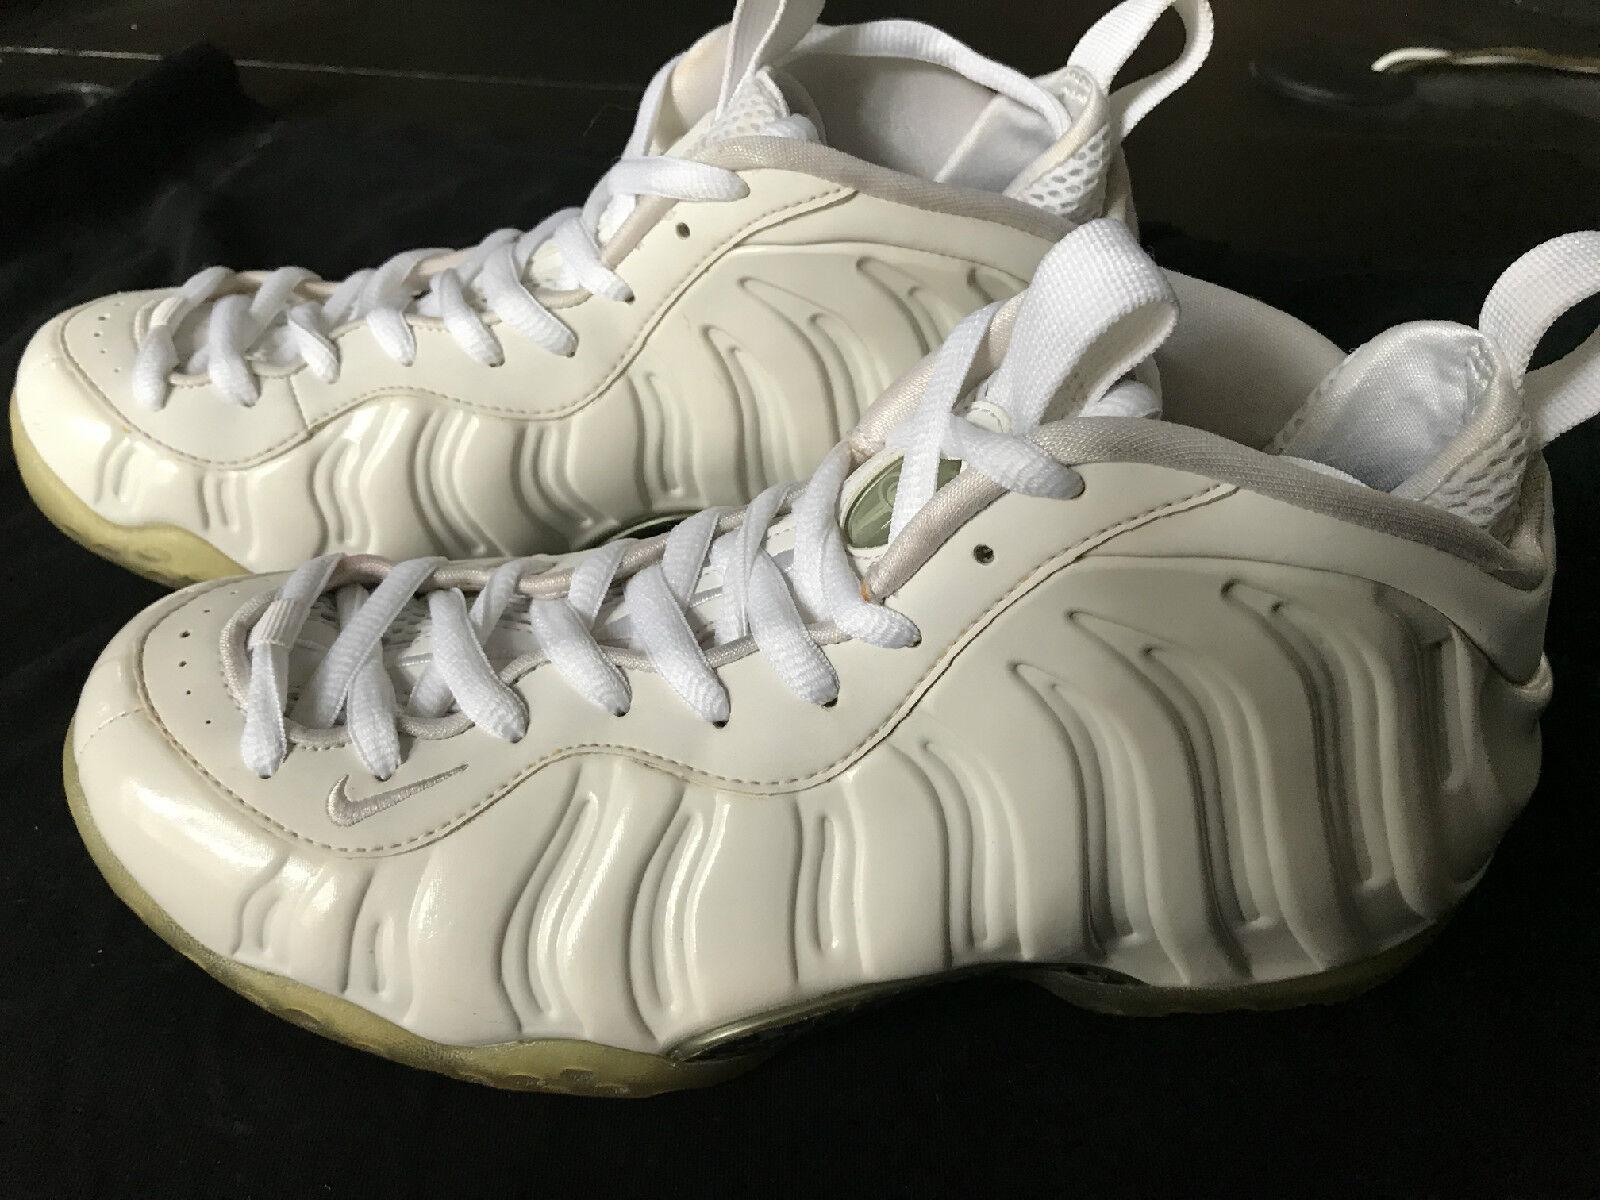 2018 Nike Air Foamposite One Blanco-out 314996-100 Blanco modelo Metallic Plata comodo el modelo Blanco mas vendido de la marca 63c71b